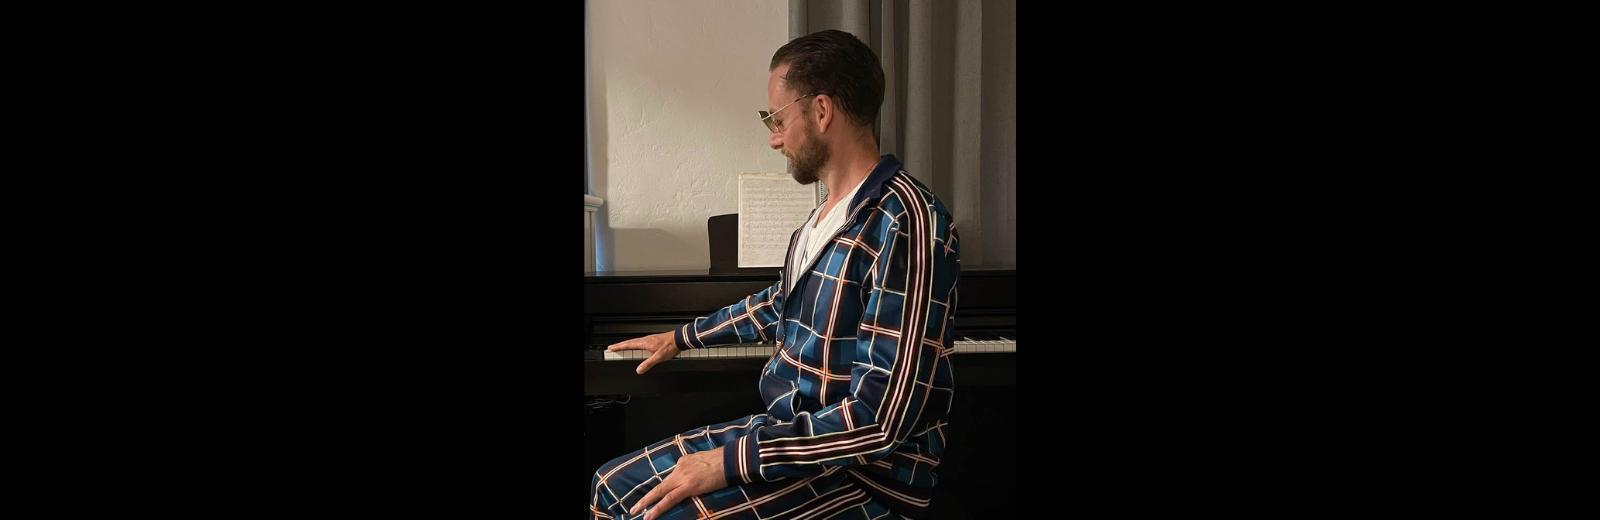 Jazz Pianist Grant Levin